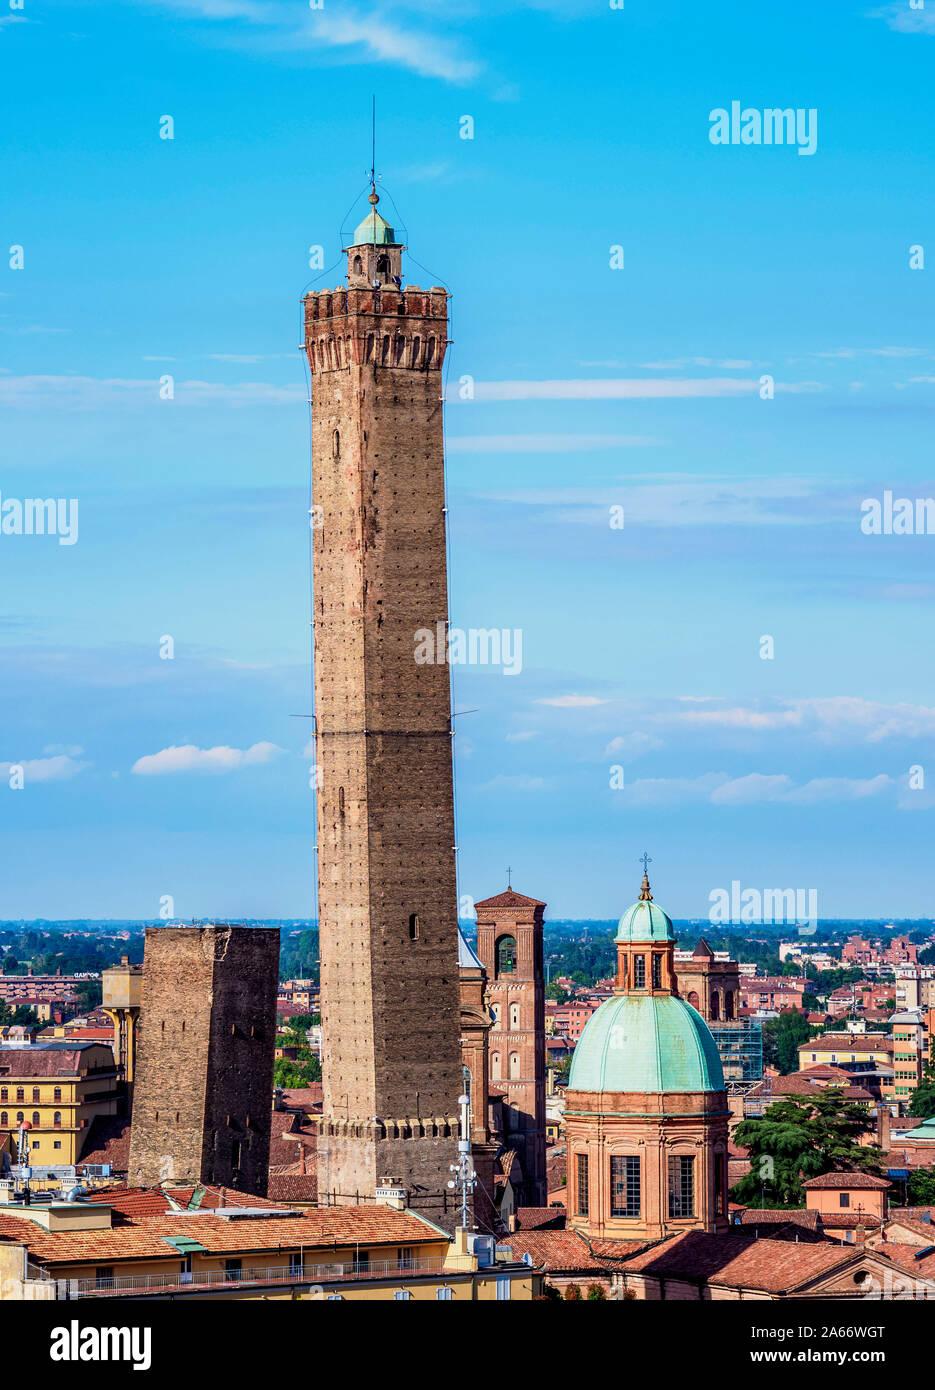 View towards the Asinelli Tower, Bologna, Emilia-Romagna, Italy Stock Photo